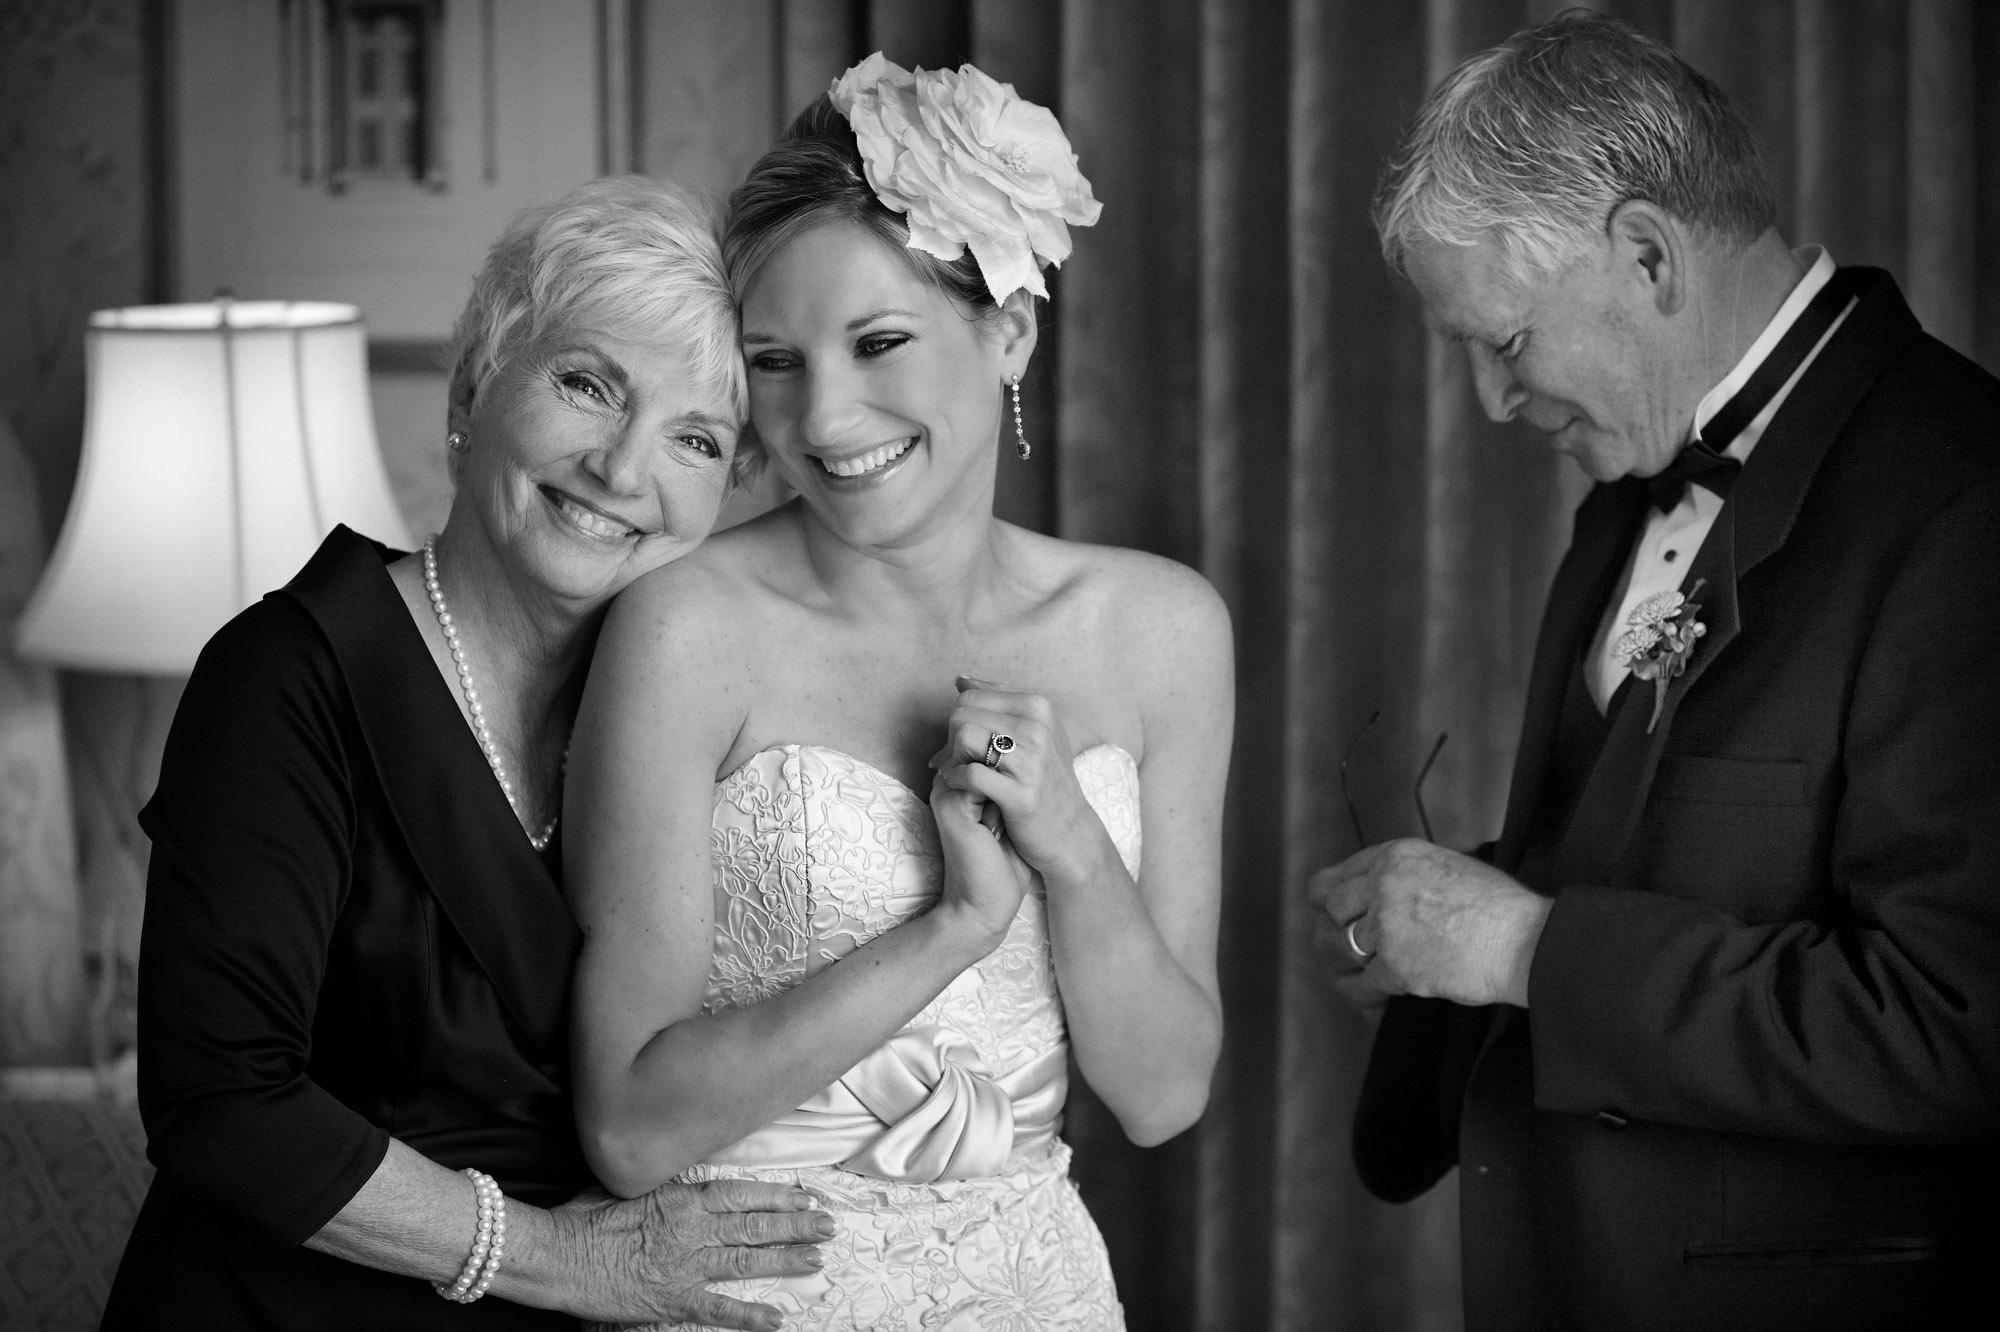 documentary-family-portrait-best-wedding-photos-jerry-ghionis-top-las-vegas-photographer